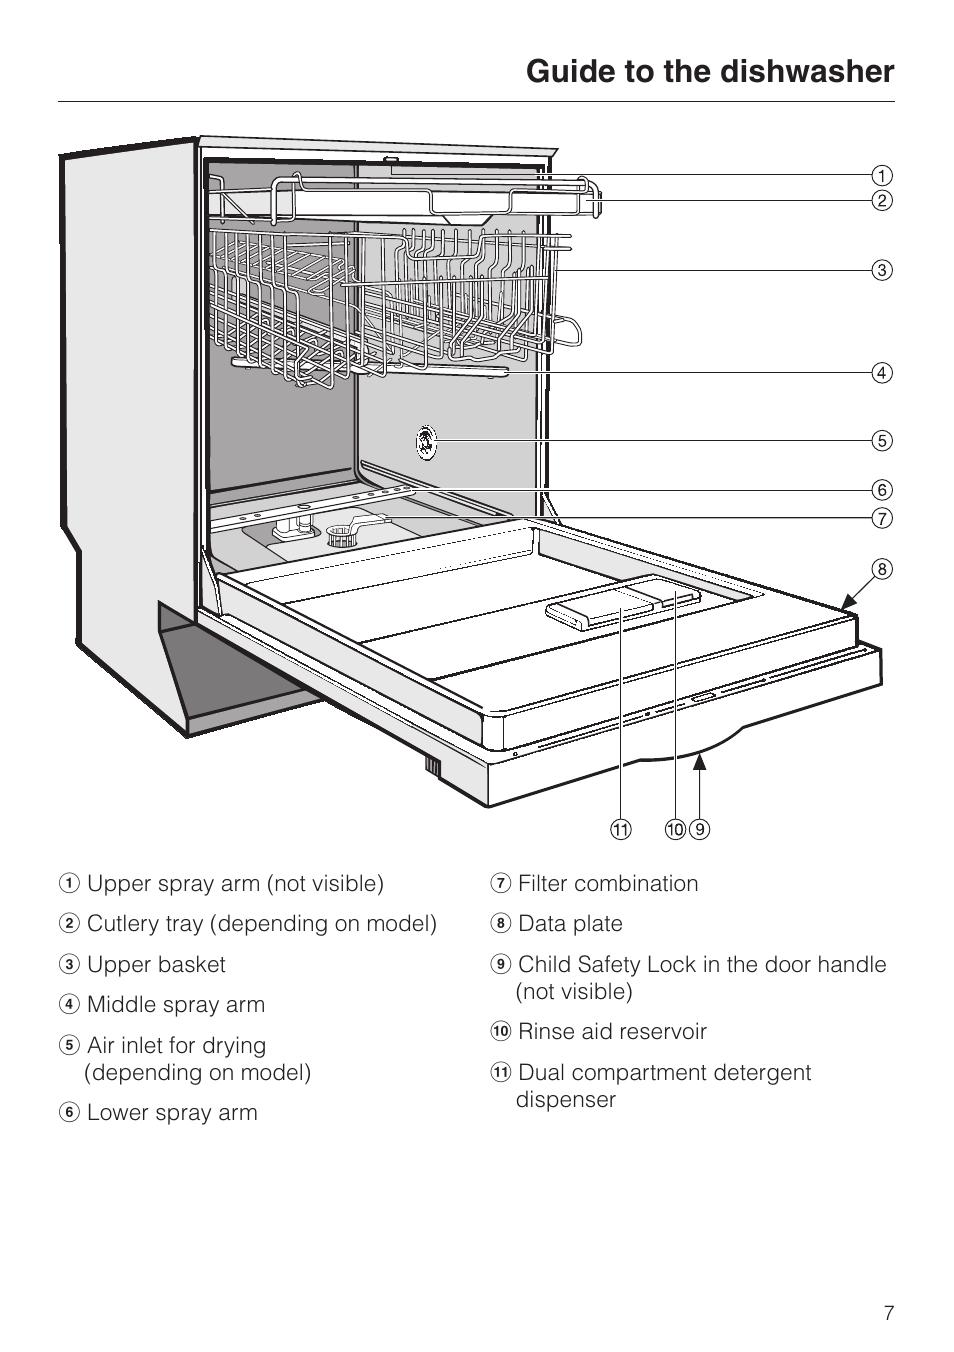 guide to the dishwasher 7 guide to the dishwasher miele advanta rh manualsdir com miele advanta series dishwasher troubleshooting